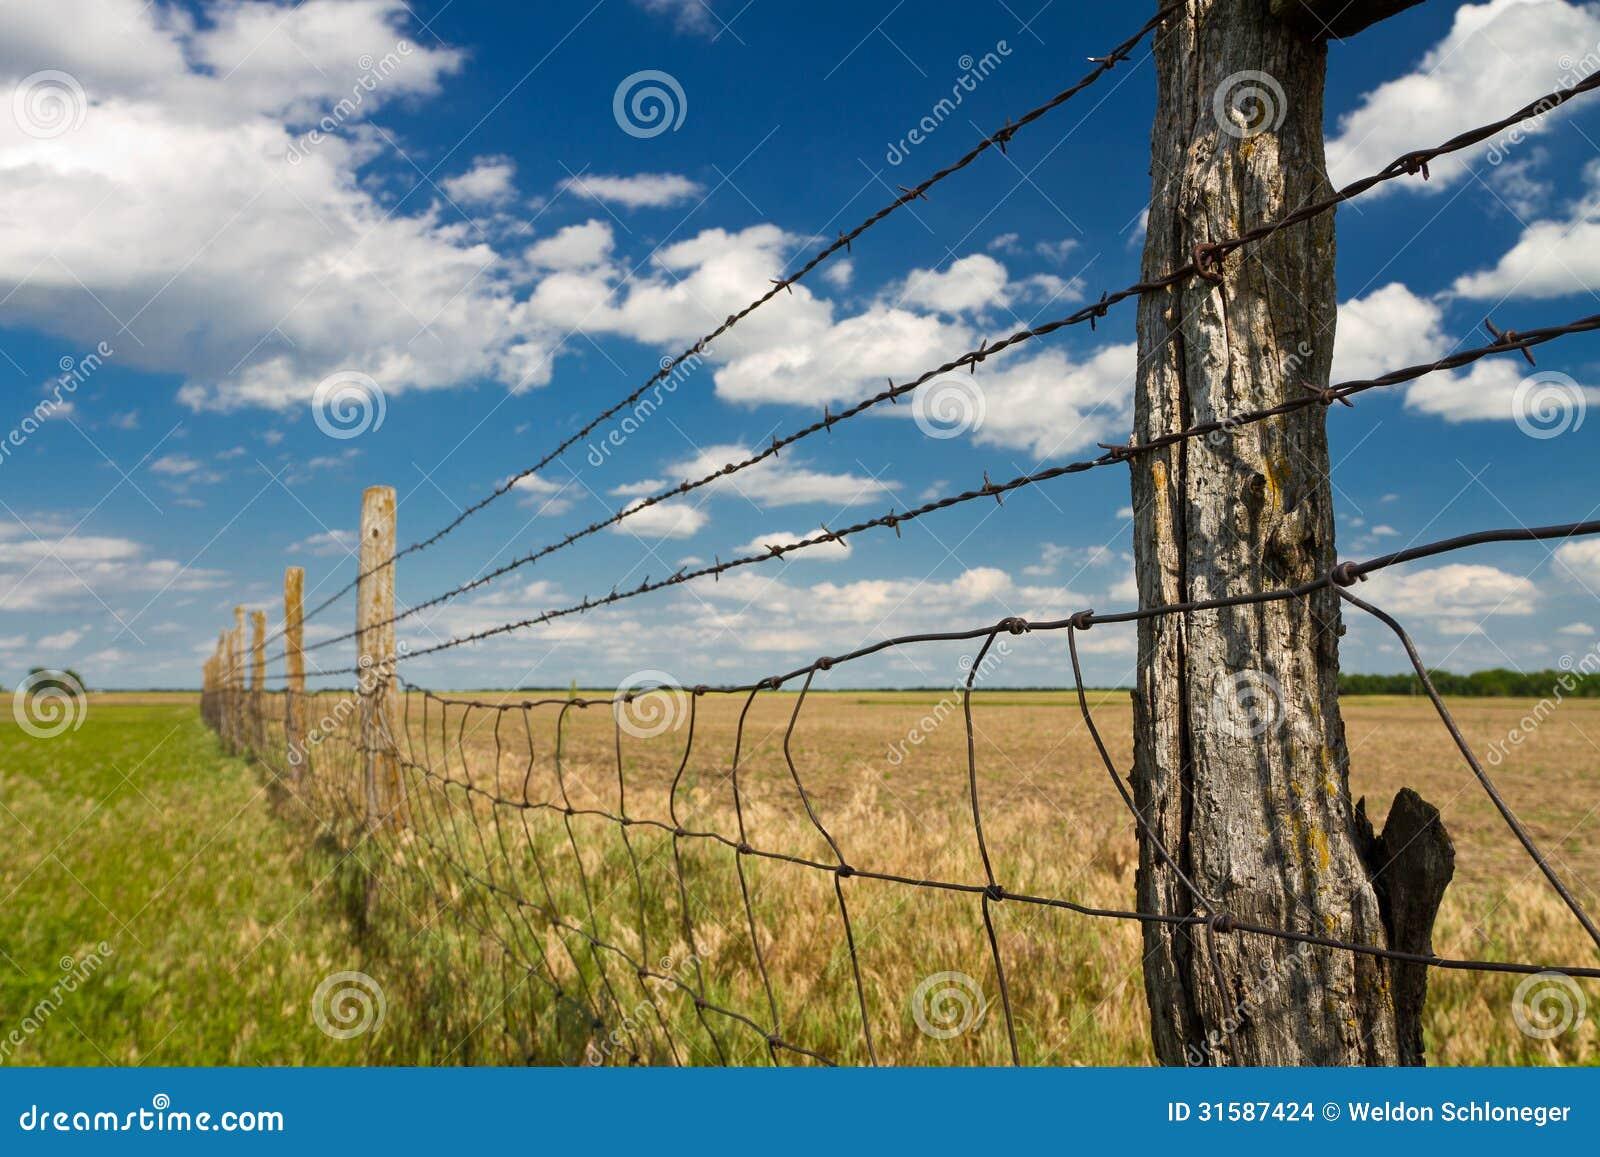 Kansas Pasture Fence, Blue Sky Stock Photo - Image of field, pasture ...